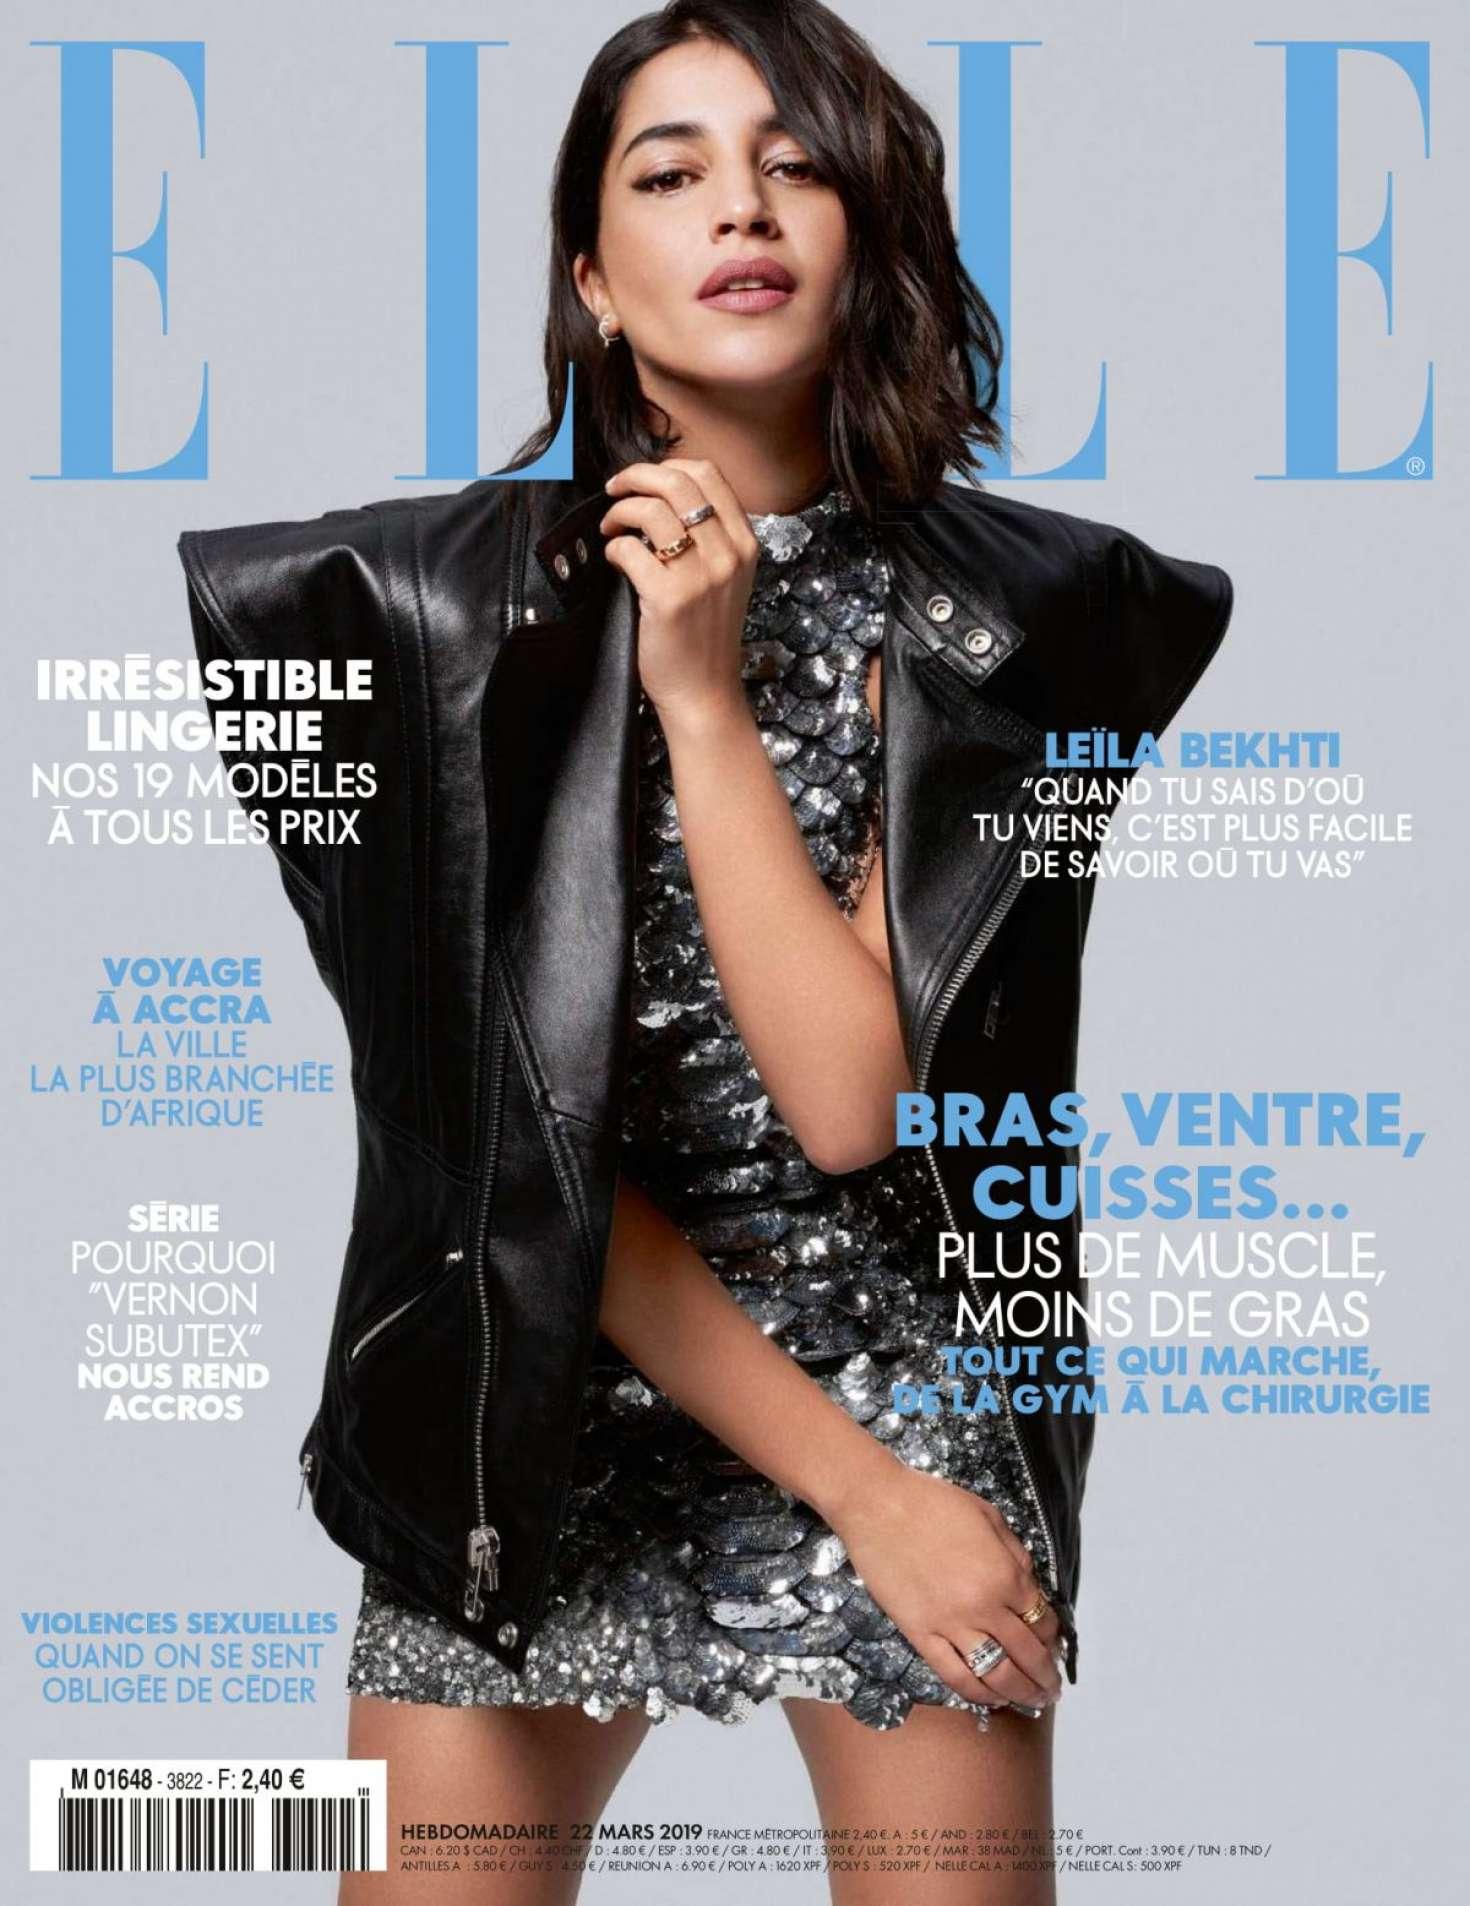 Leila Bekhti for Elle France Magazine (March 2019)